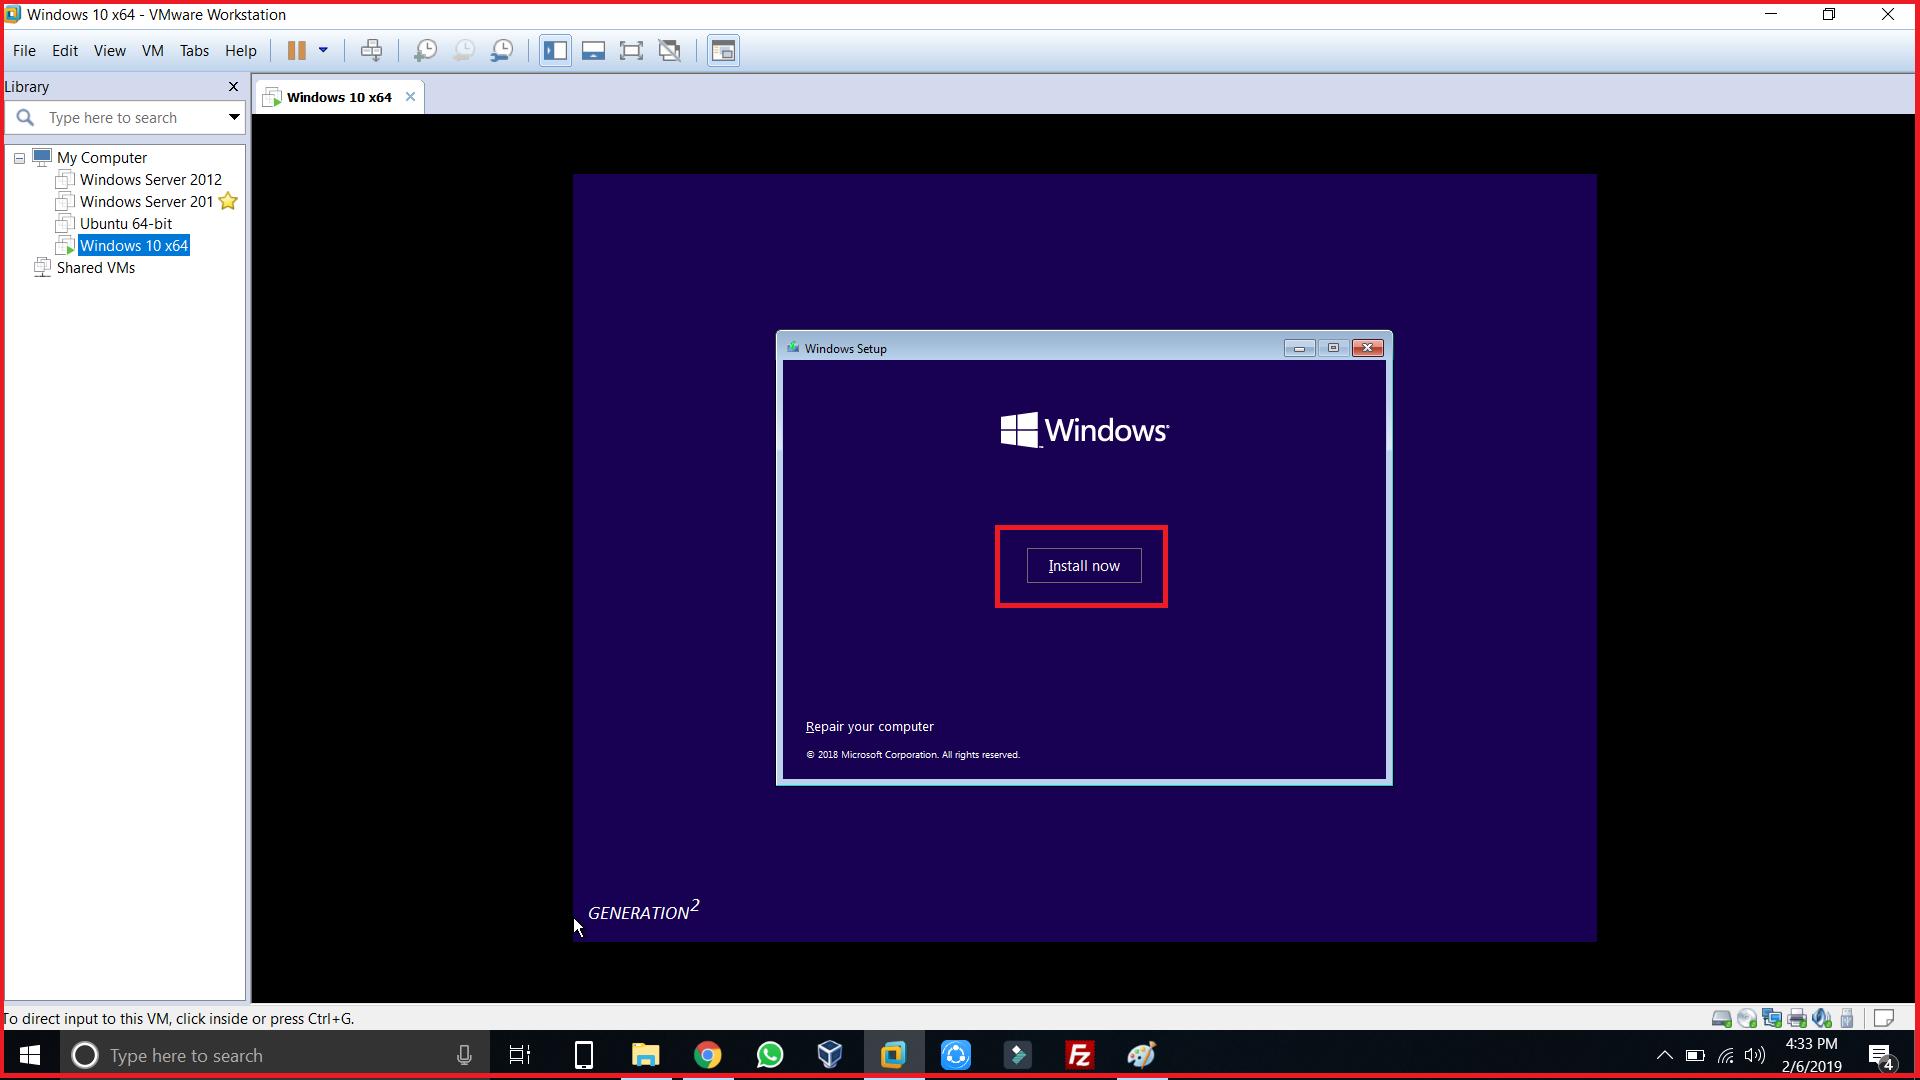 Windows install now